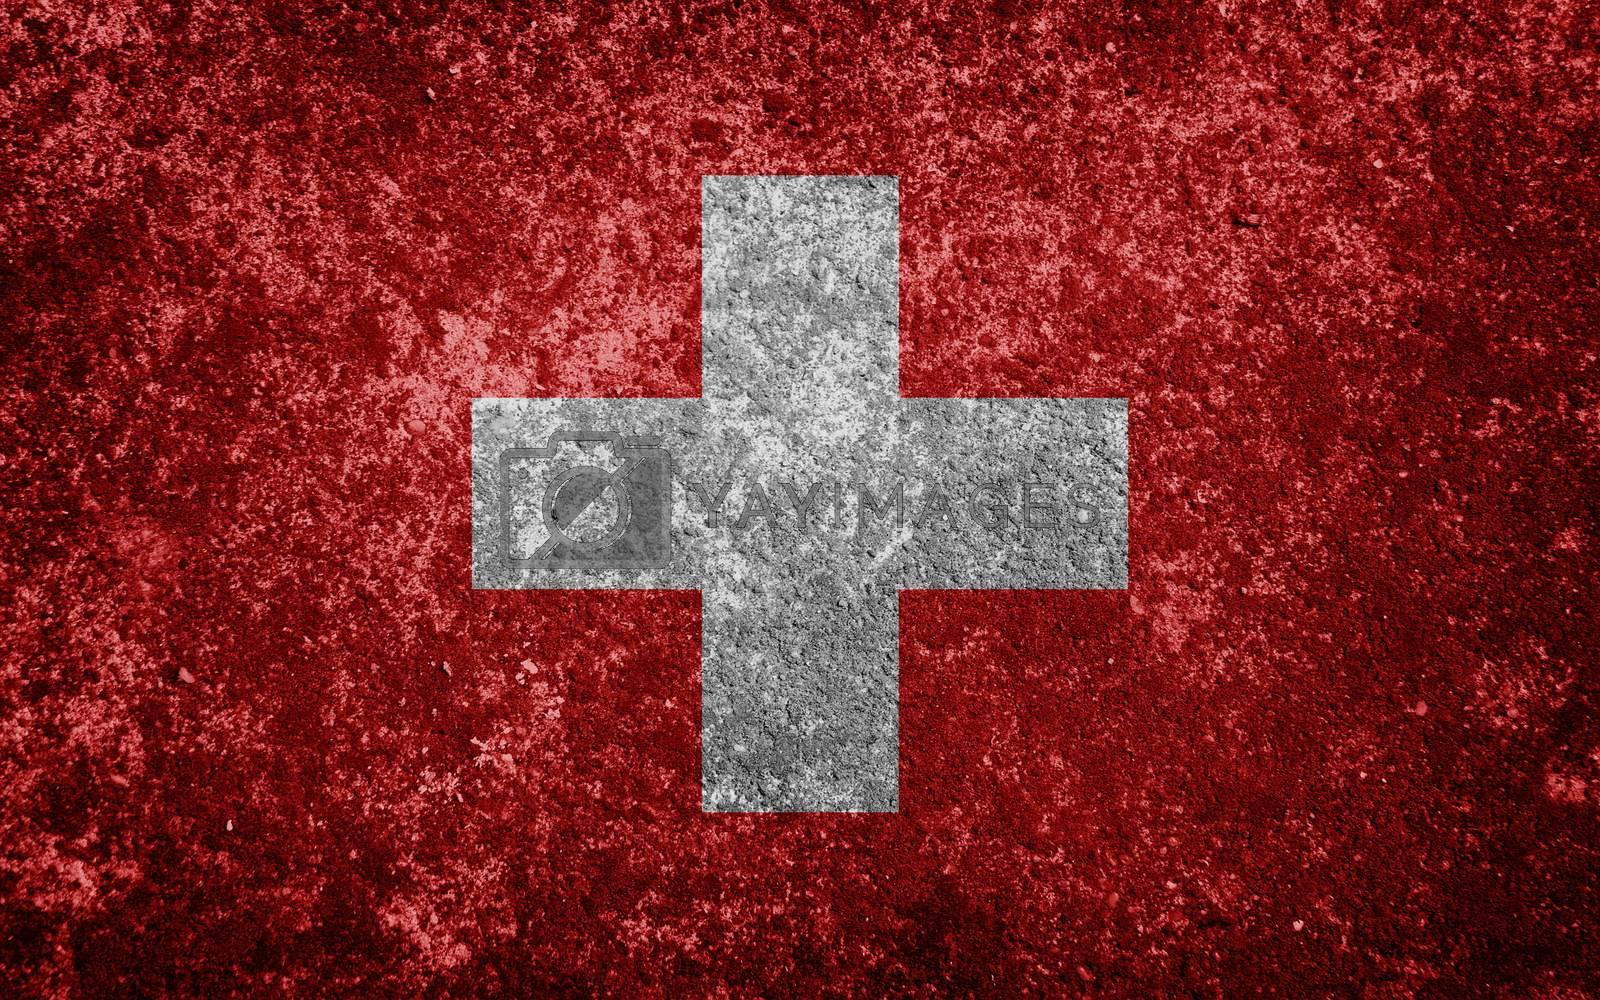 Switzerland flag painted on concrete